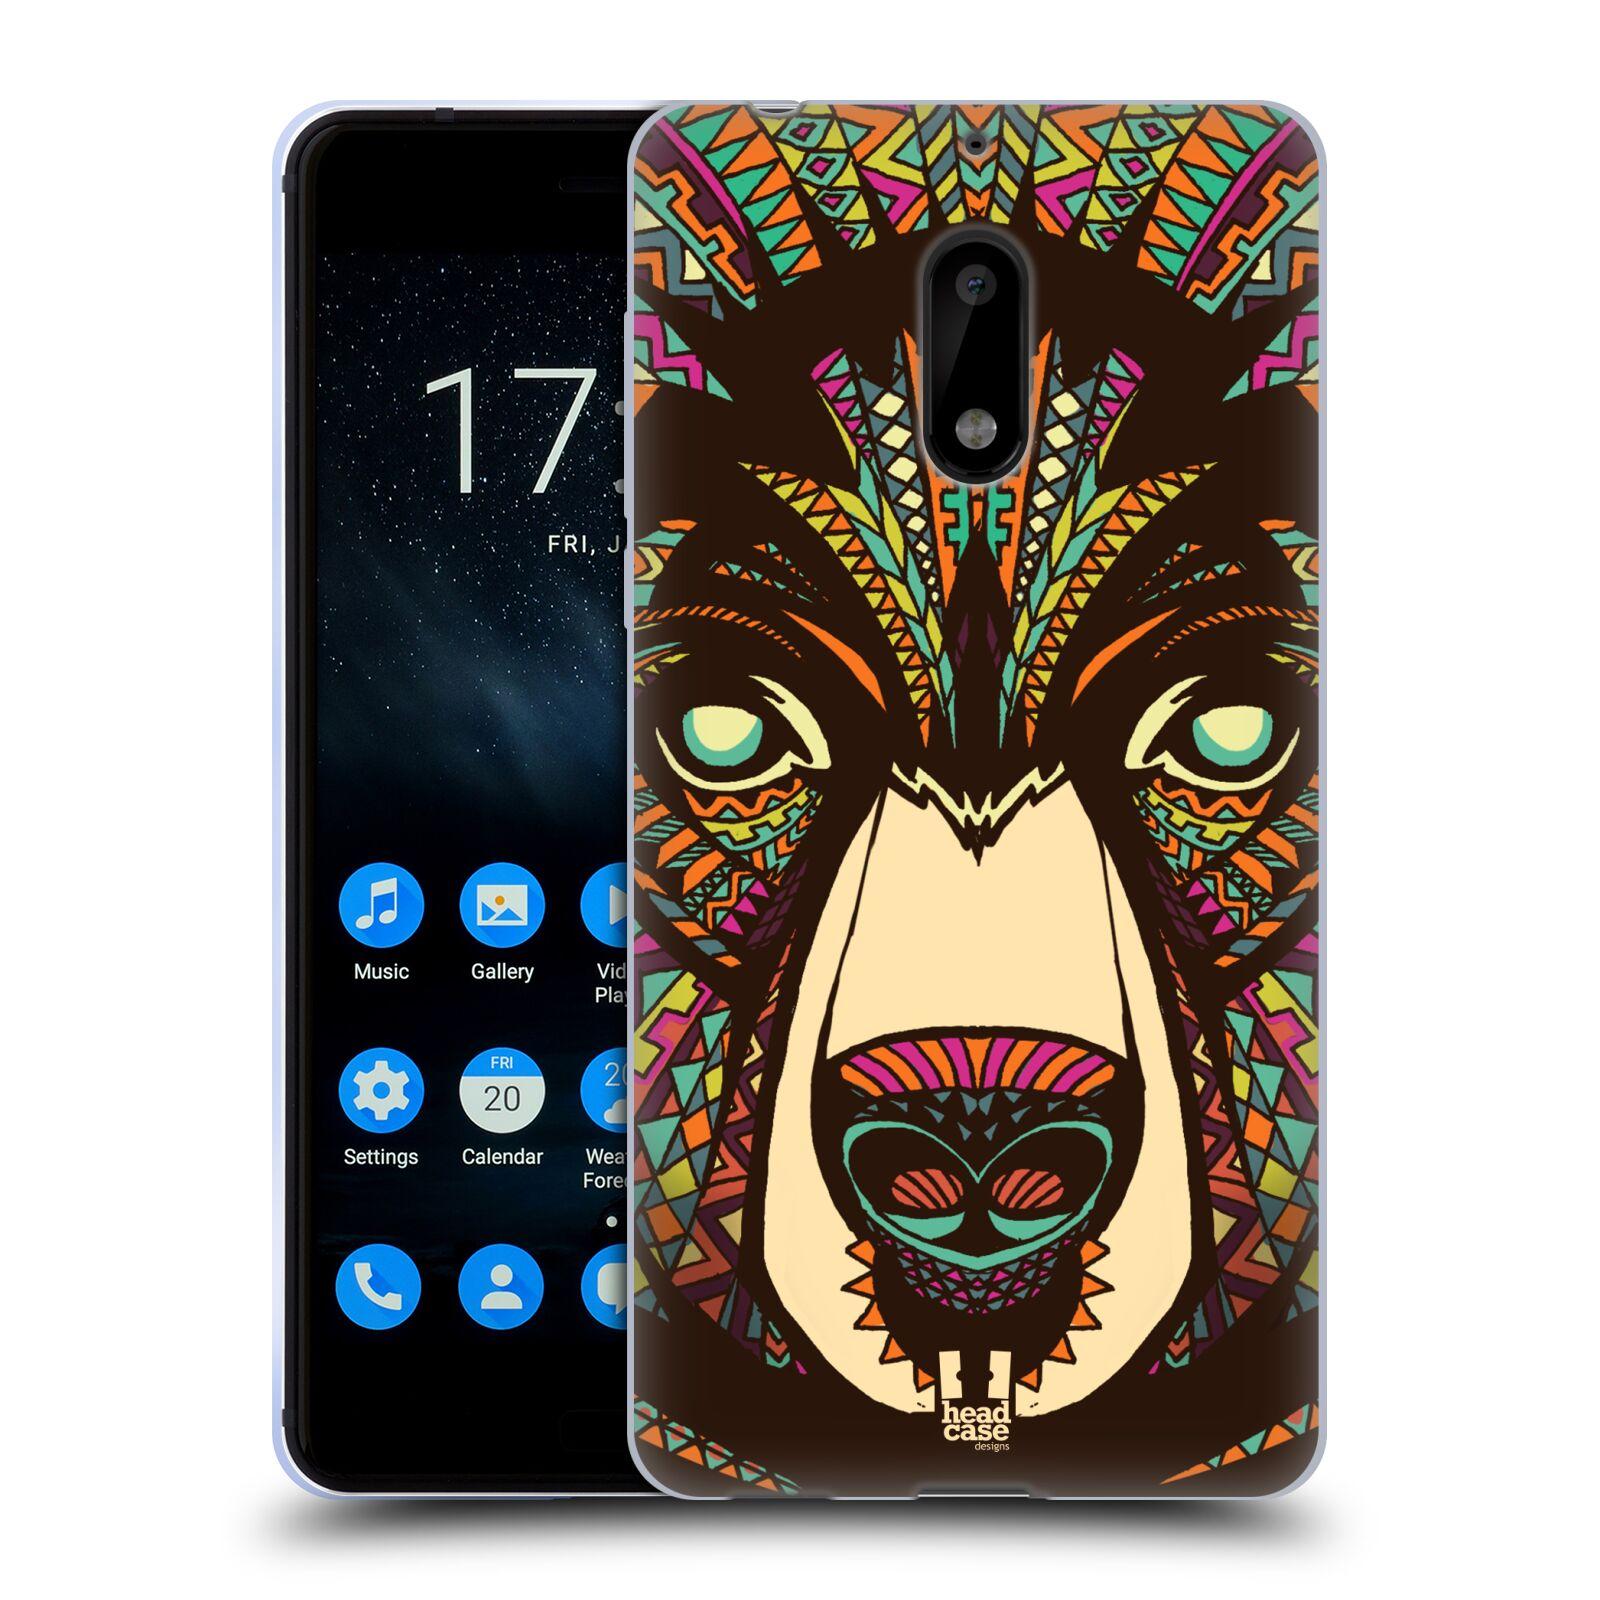 Silikonové pouzdro na mobil Nokia 6 - Head Case - AZTEC MEDVĚD